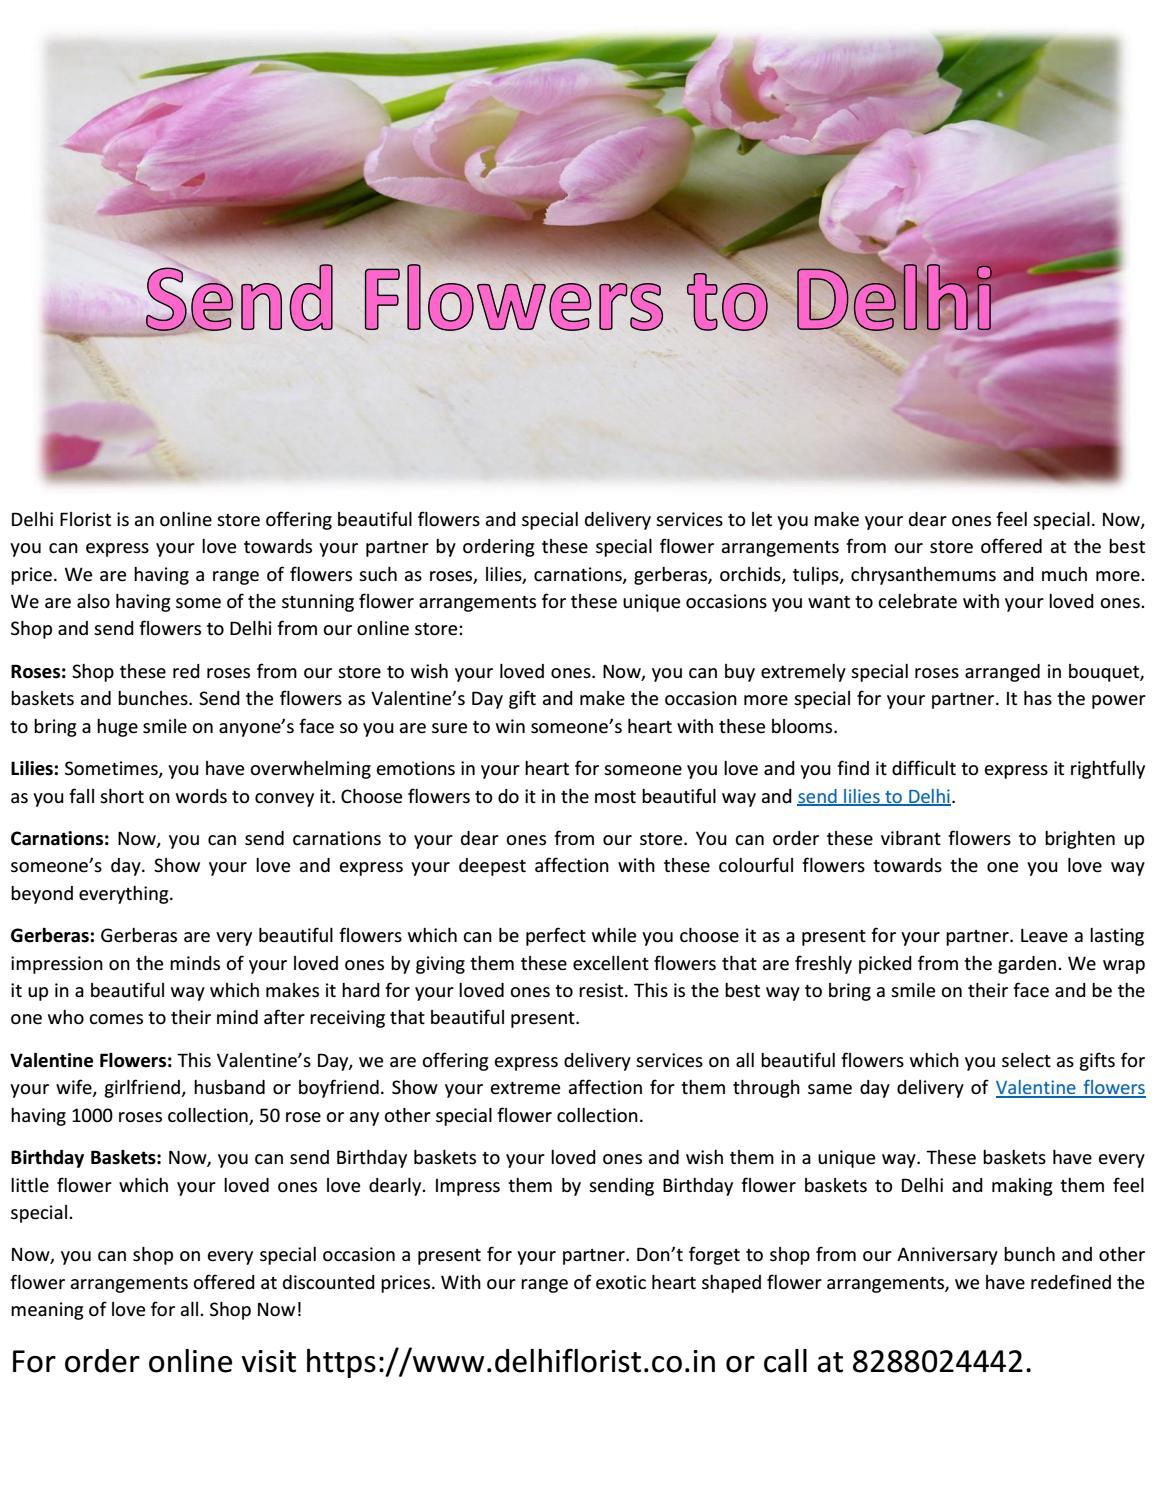 Send Flowers To Delhi by Delhi Florist - issuu